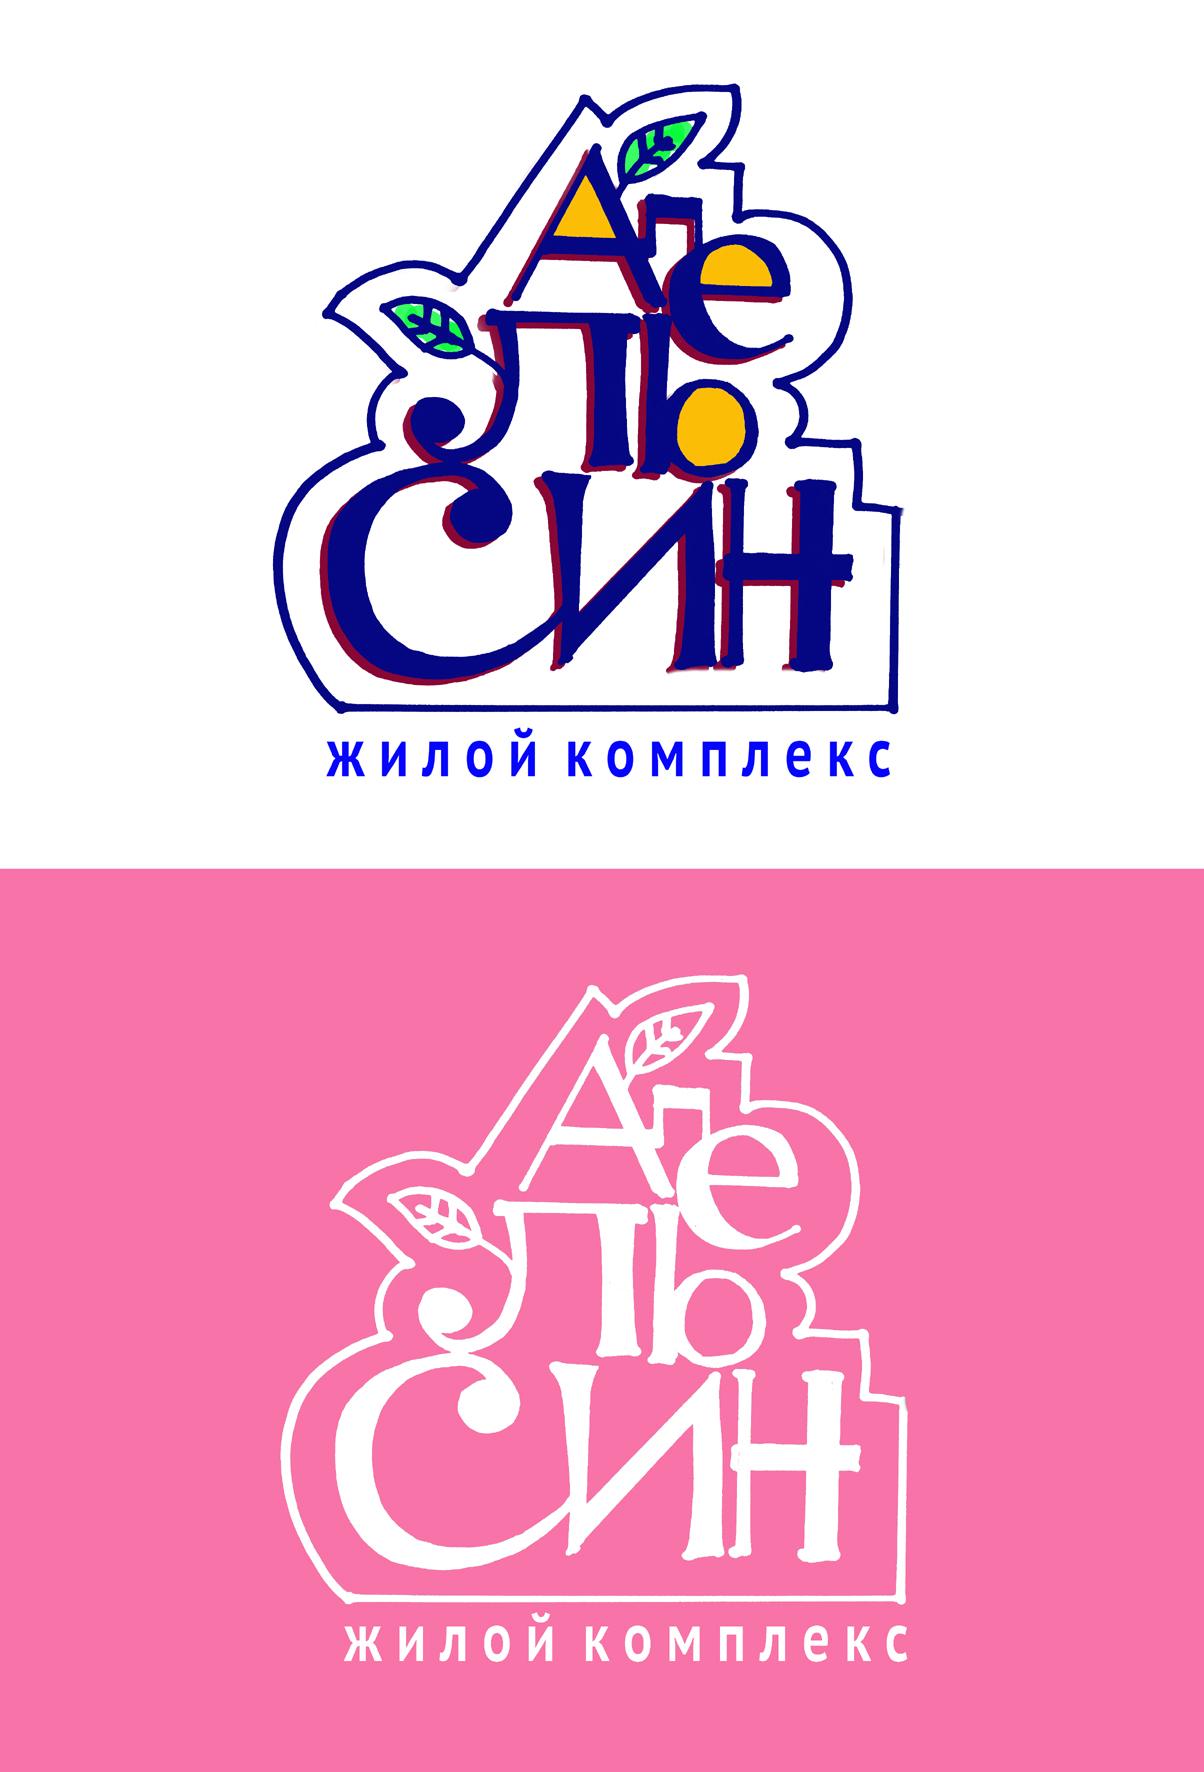 Логотип и фирменный стиль фото f_1575a722dfc4ae29.jpg